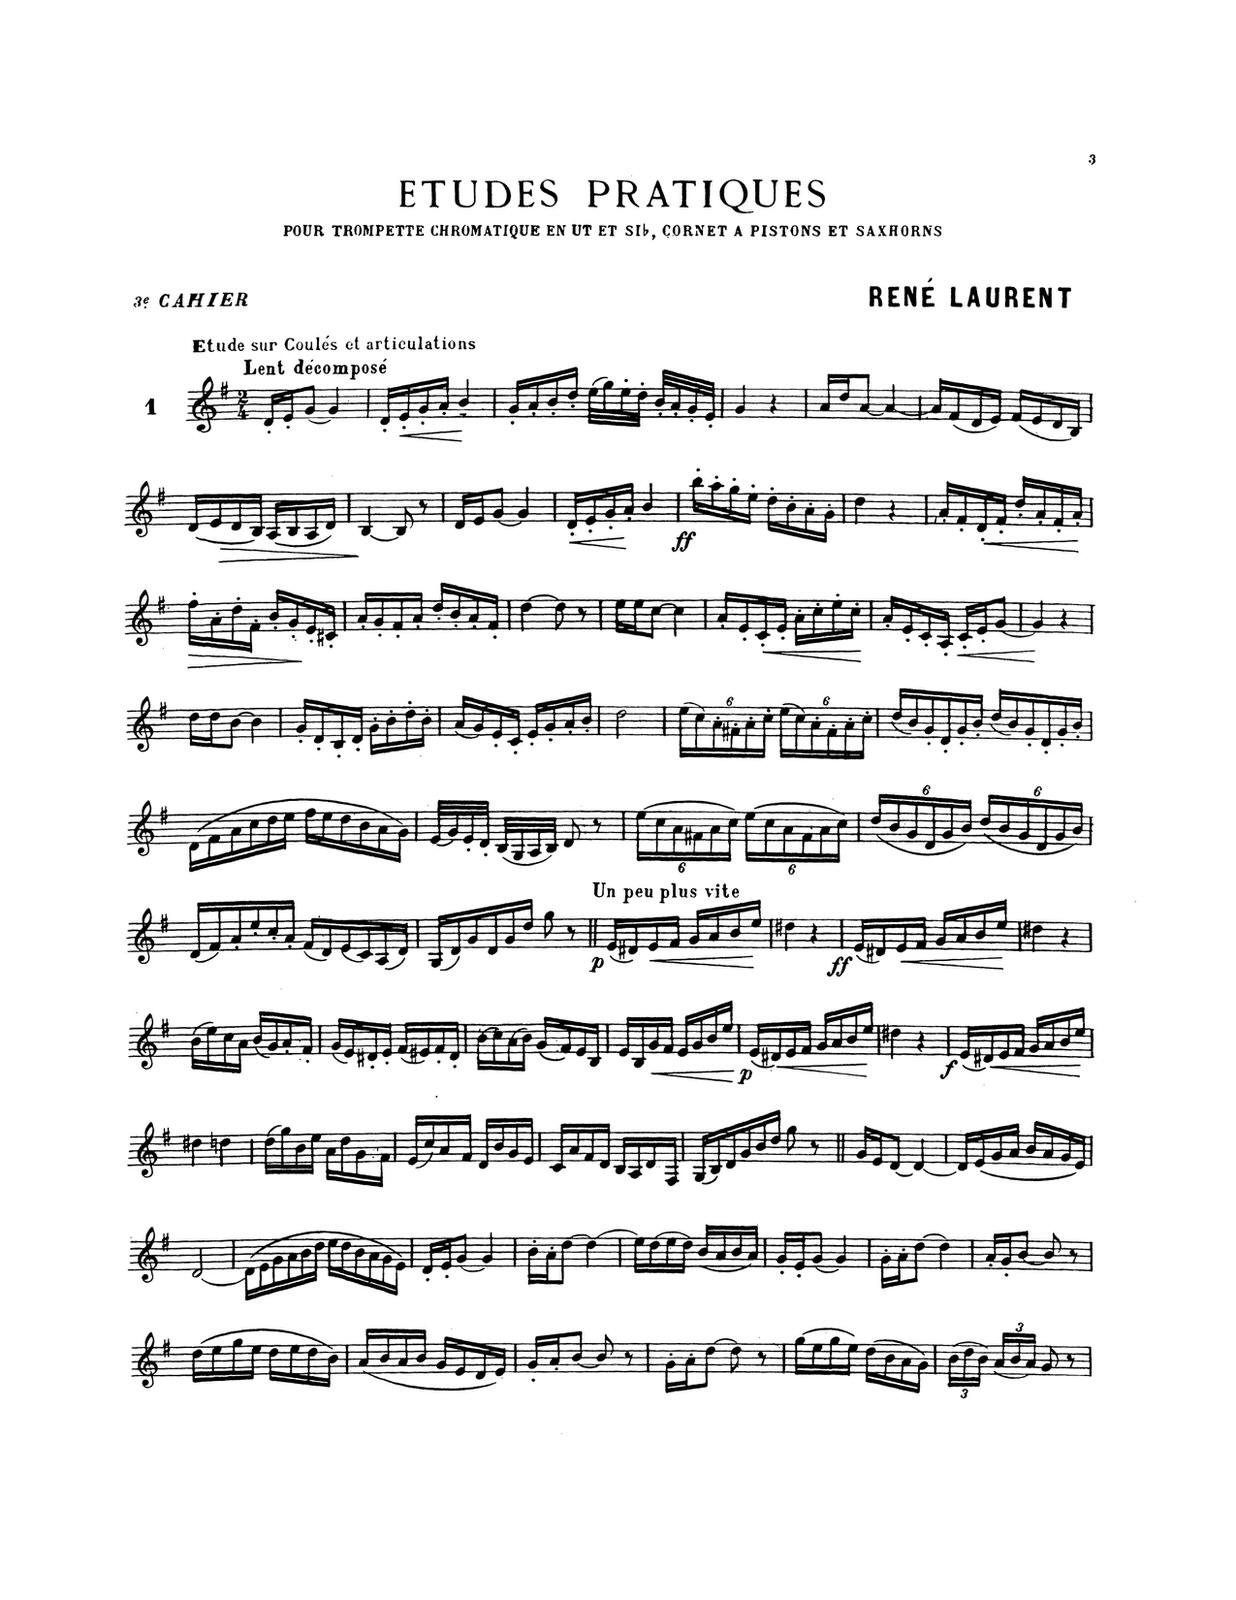 Laurent, Etude Pratiques Vol.3 PDF